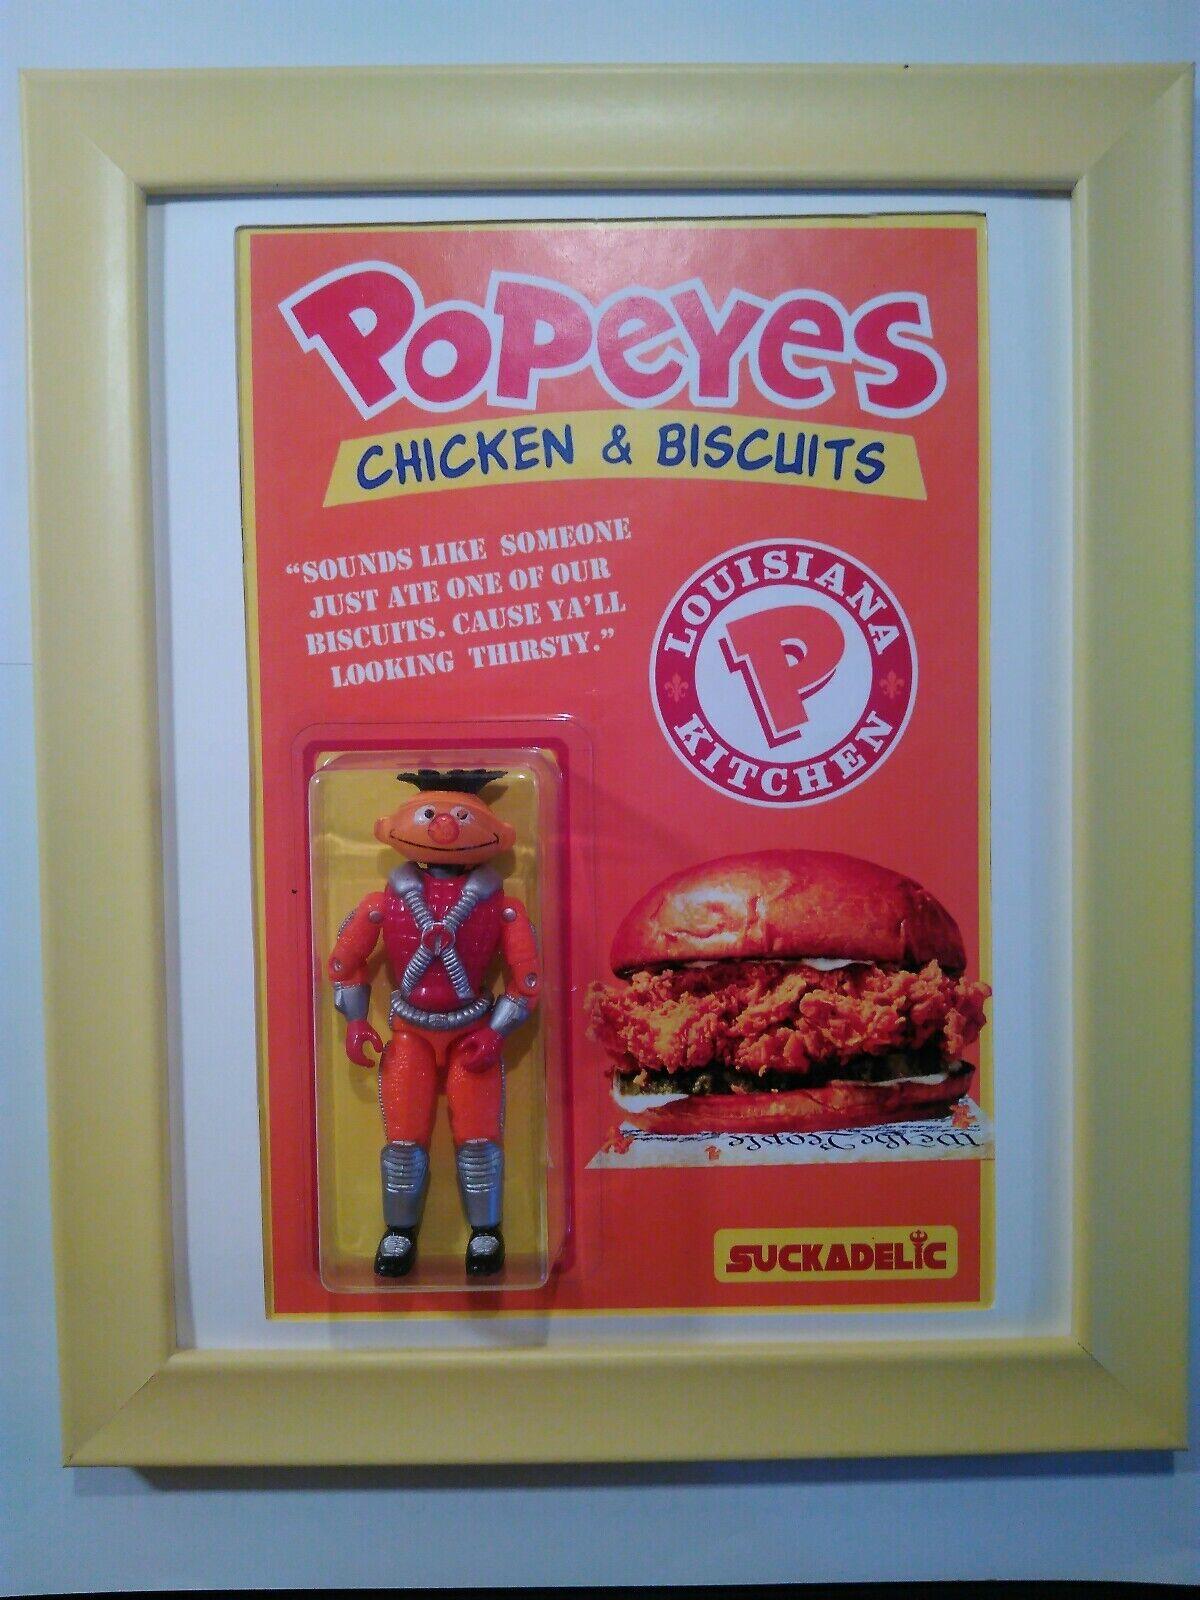 Sucklord Popeyes sándwich de pollo comida rápida SUCKADELIC botaleg Ernie G.i. Joe